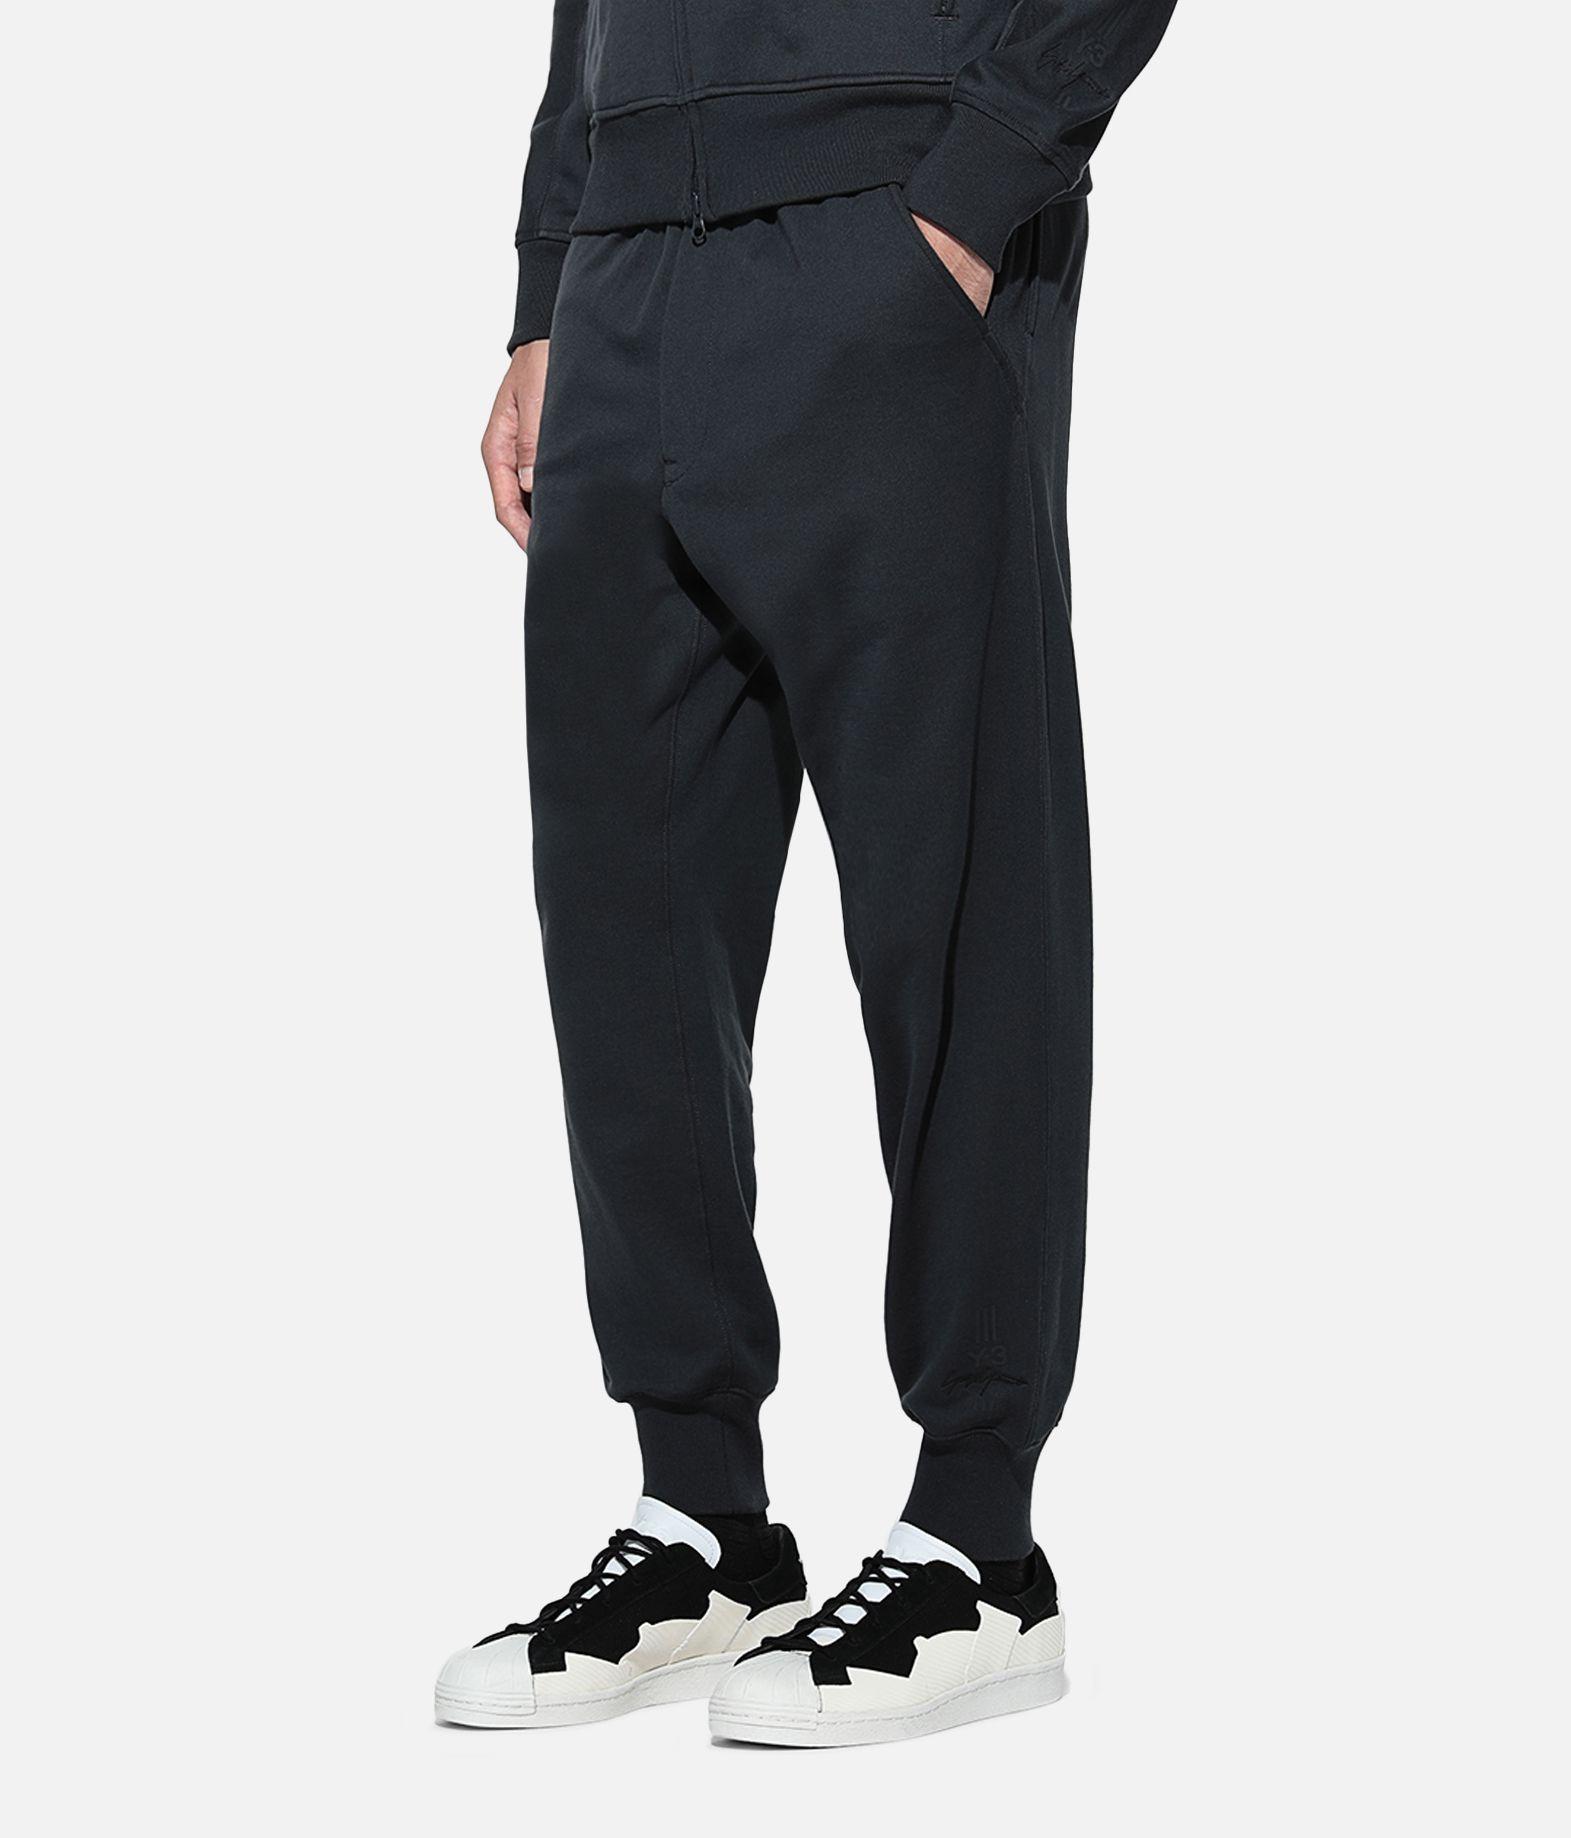 Y-3 Y-3 Classic Cuffed Pants スウェットパンツ メンズ e